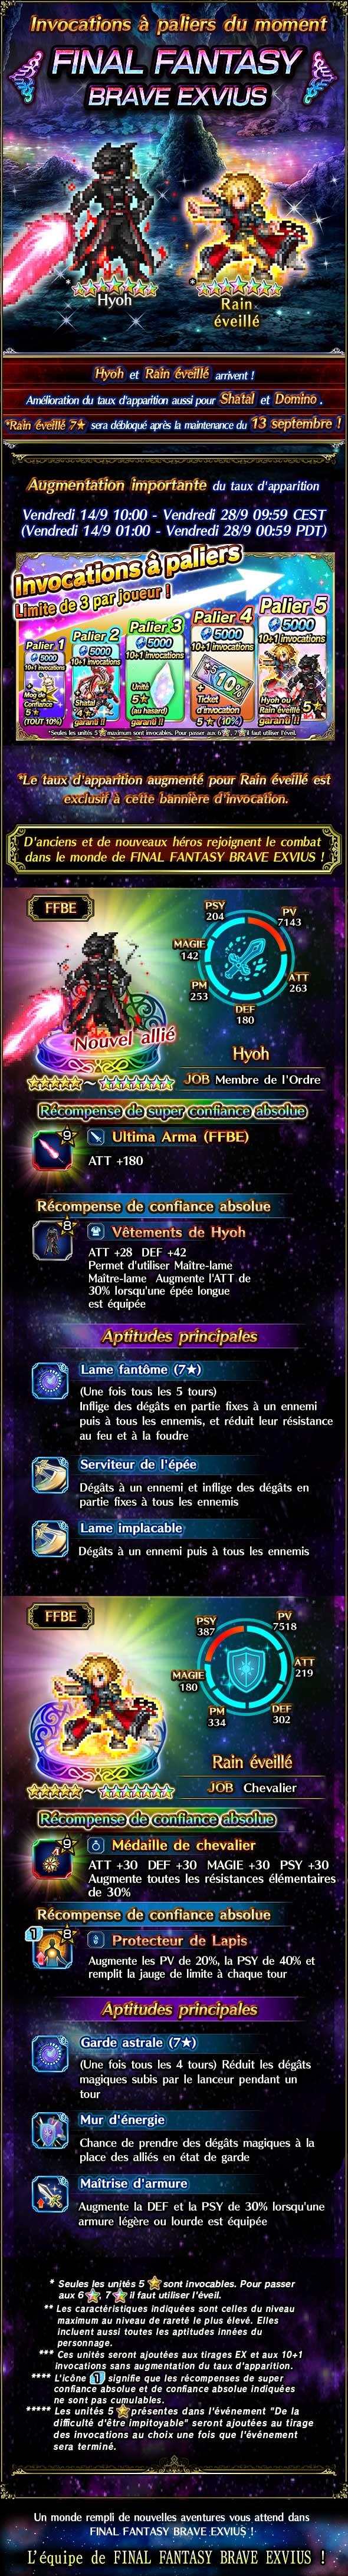 Invocation a paliers du moment - FFBE (Hyoh/ARain) HyohStepUp